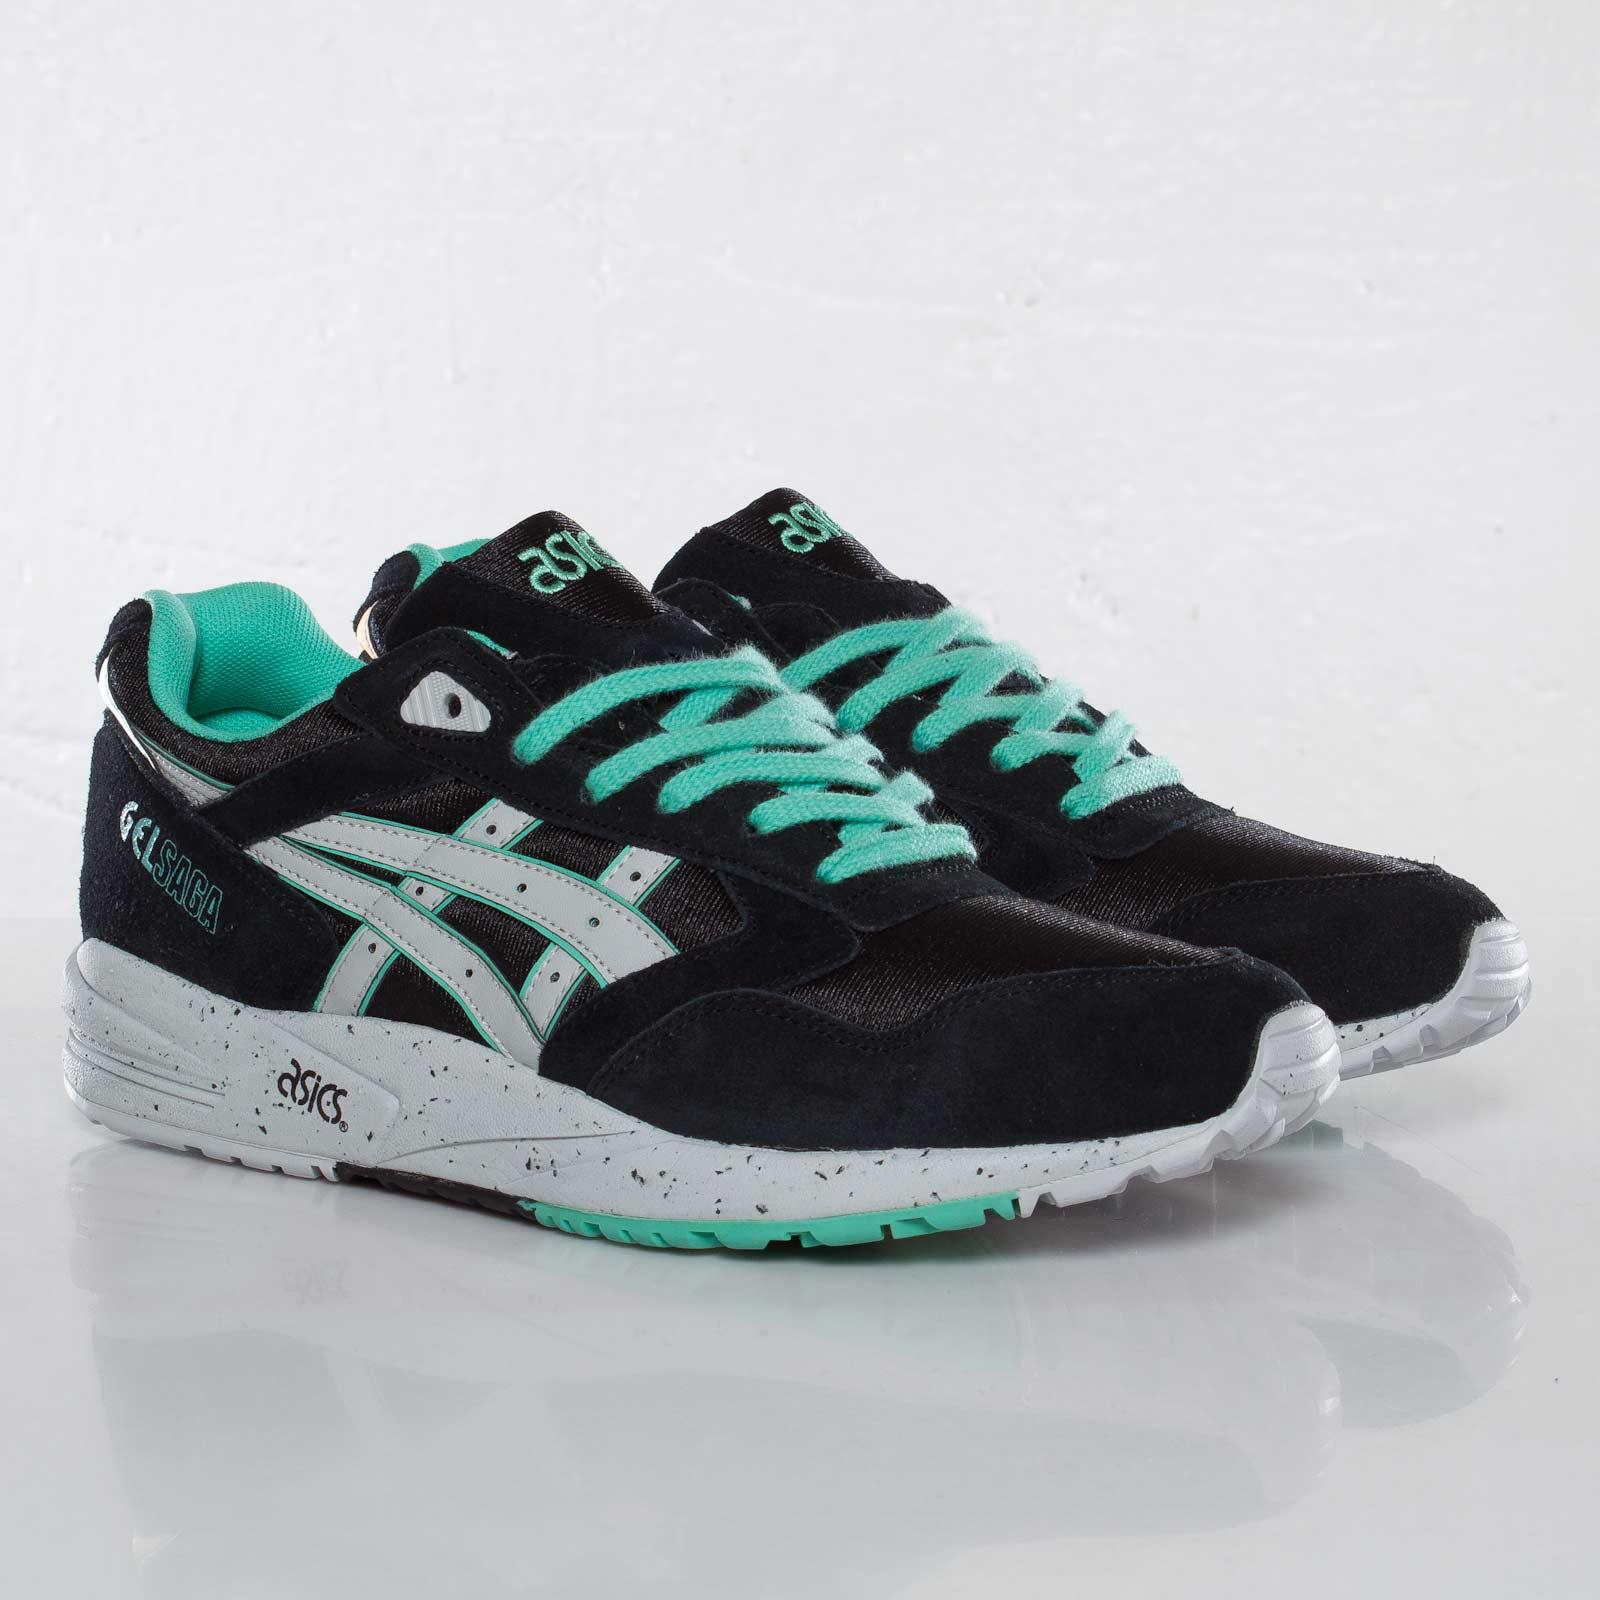 new product 0a1c4 8a1f5 ASICS Tiger Gel Saga - H137k-9011 - Sneakersnstuff ...